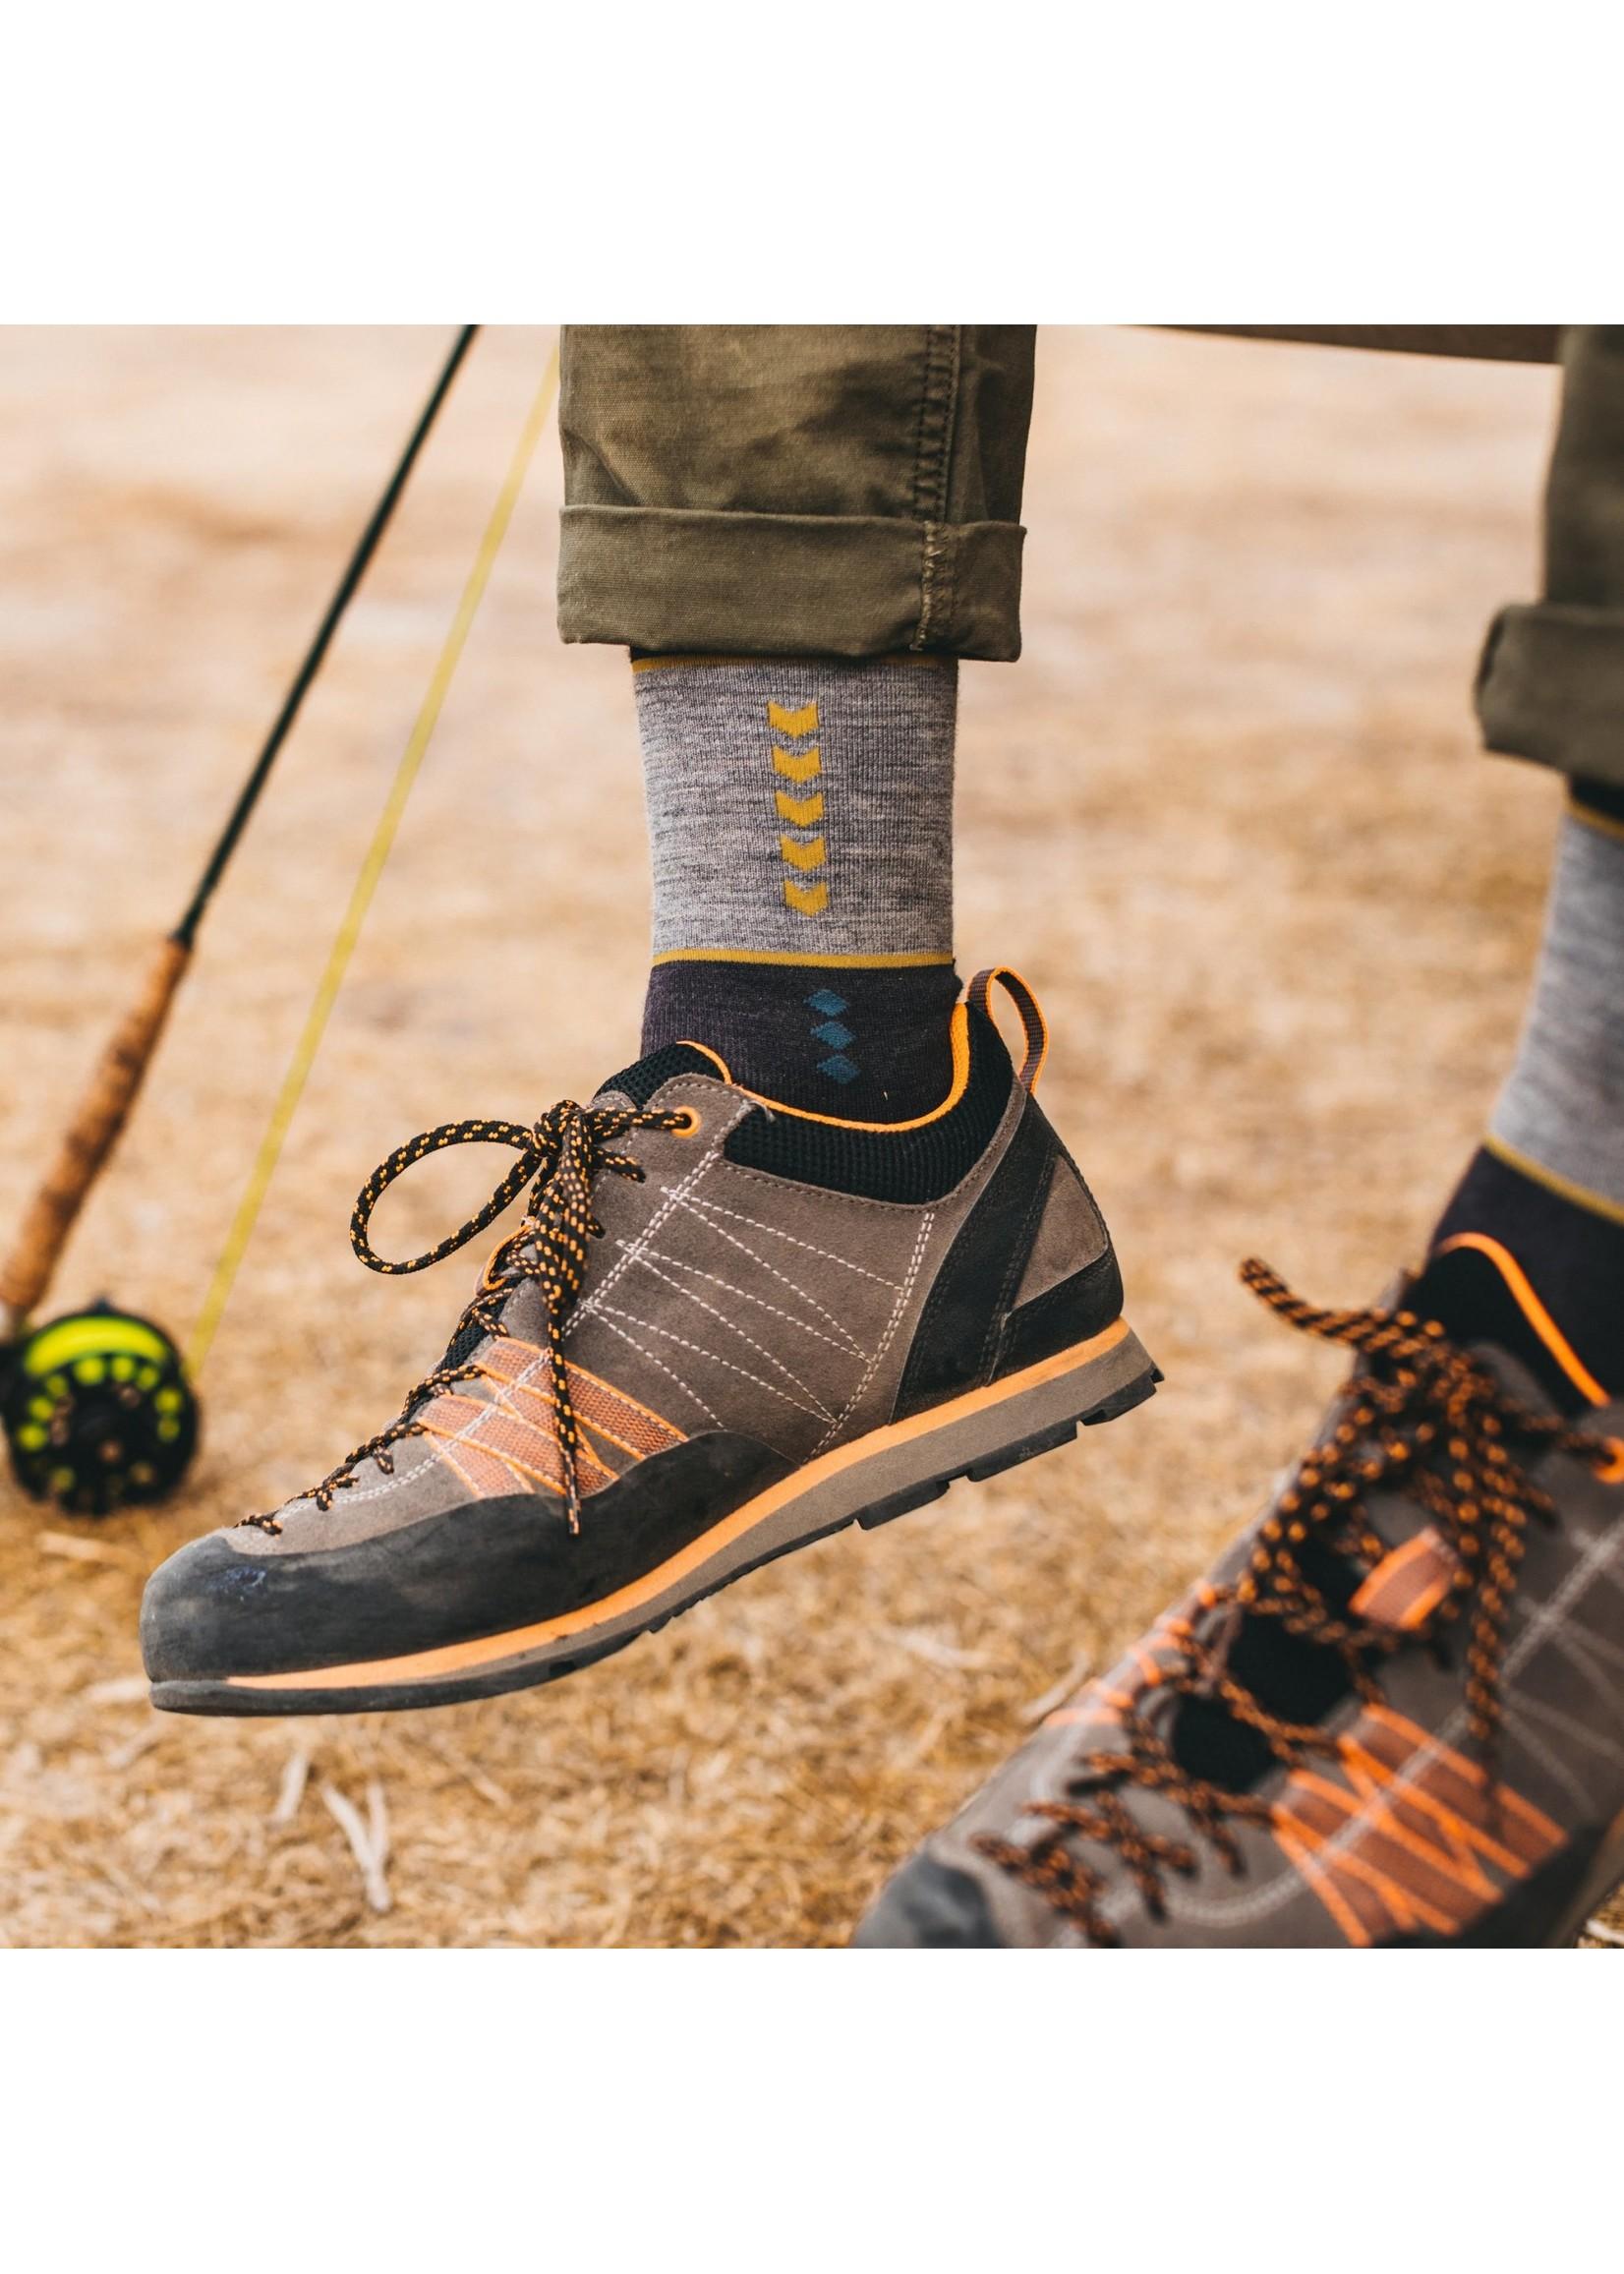 Darn Tough Men's Retro Crew Lightweight Lifestyle Socks